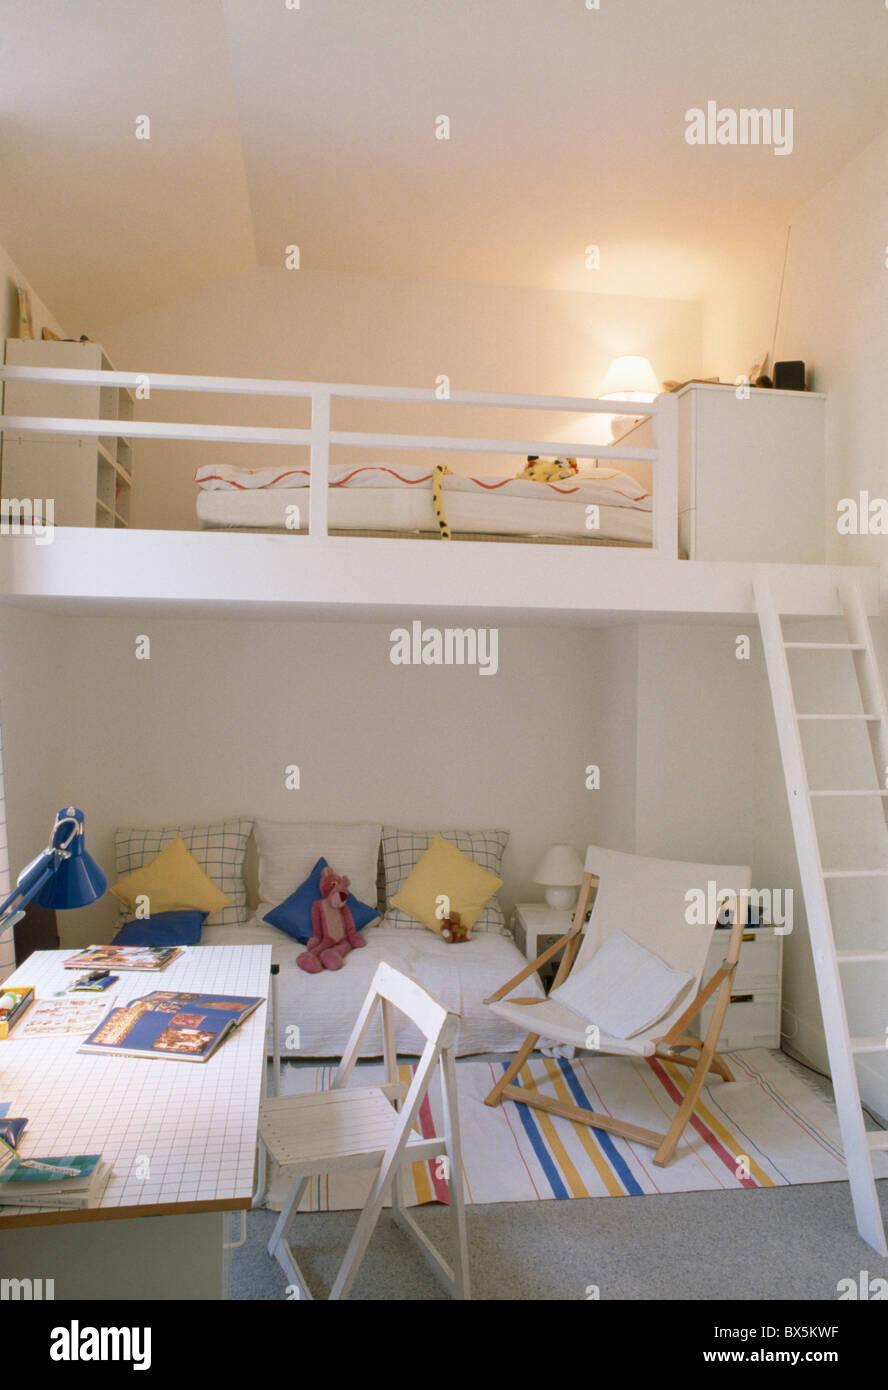 Mezzanine Apartment Stockfotos & Mezzanine Apartment Bilder - Alamy